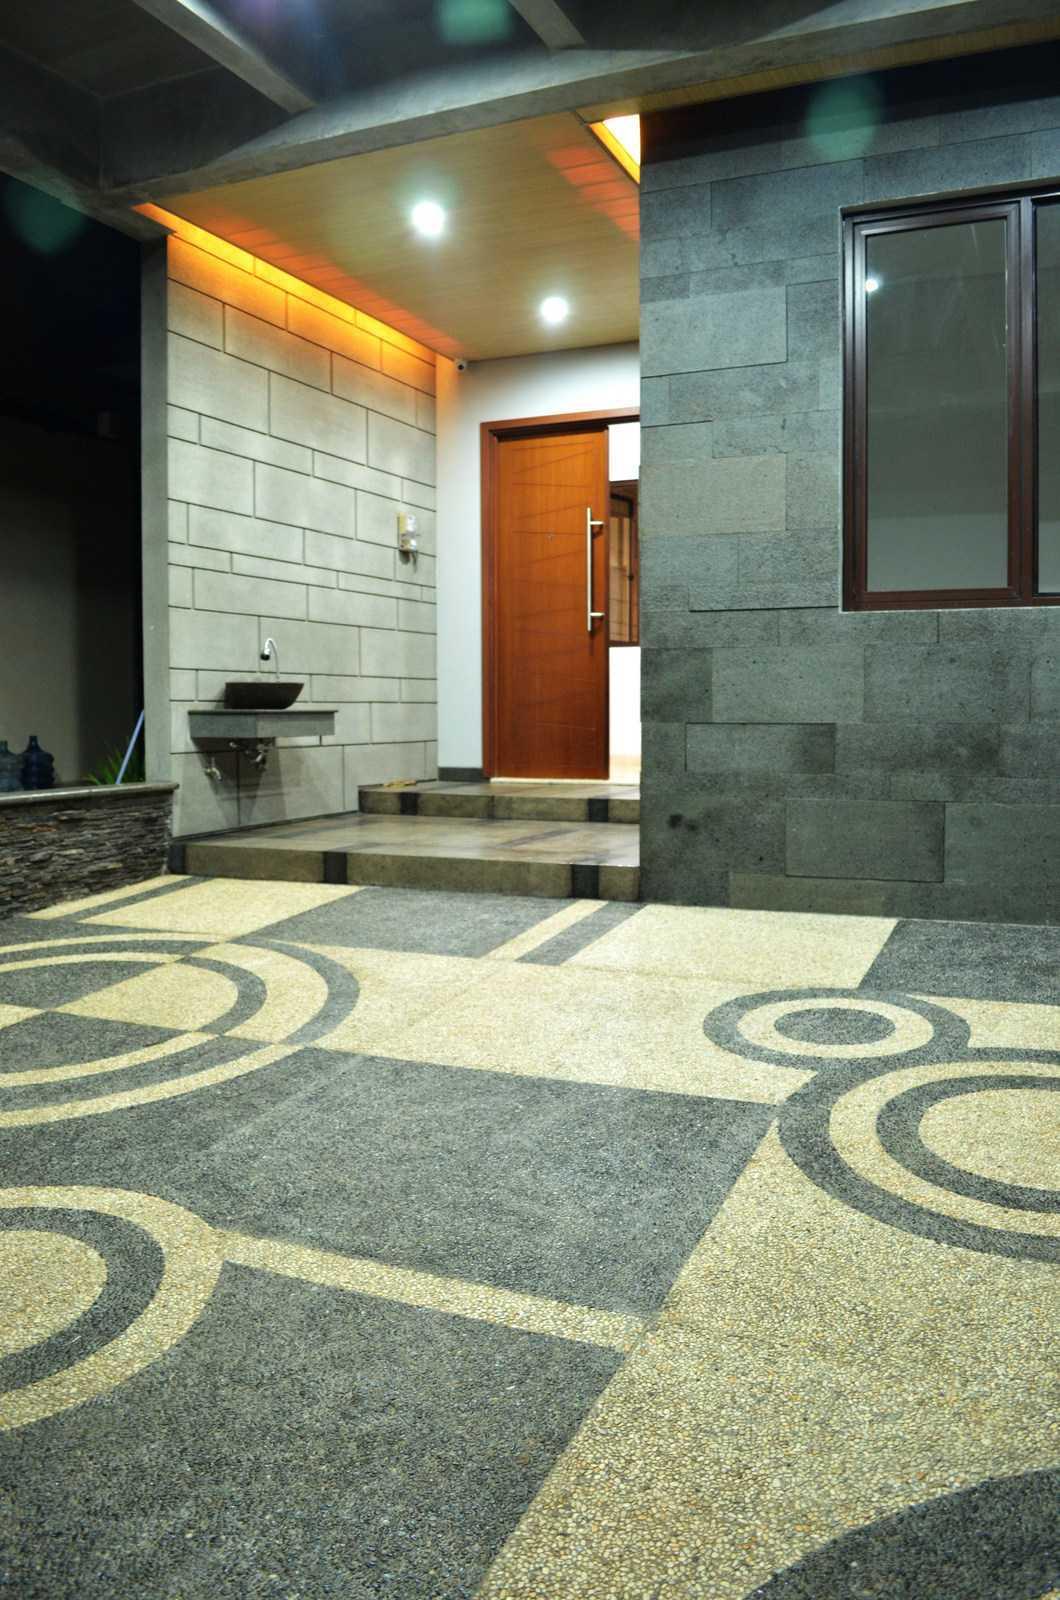 X3M Architects Nittaya A3 15 House Bsd Bsd Front Door   25331